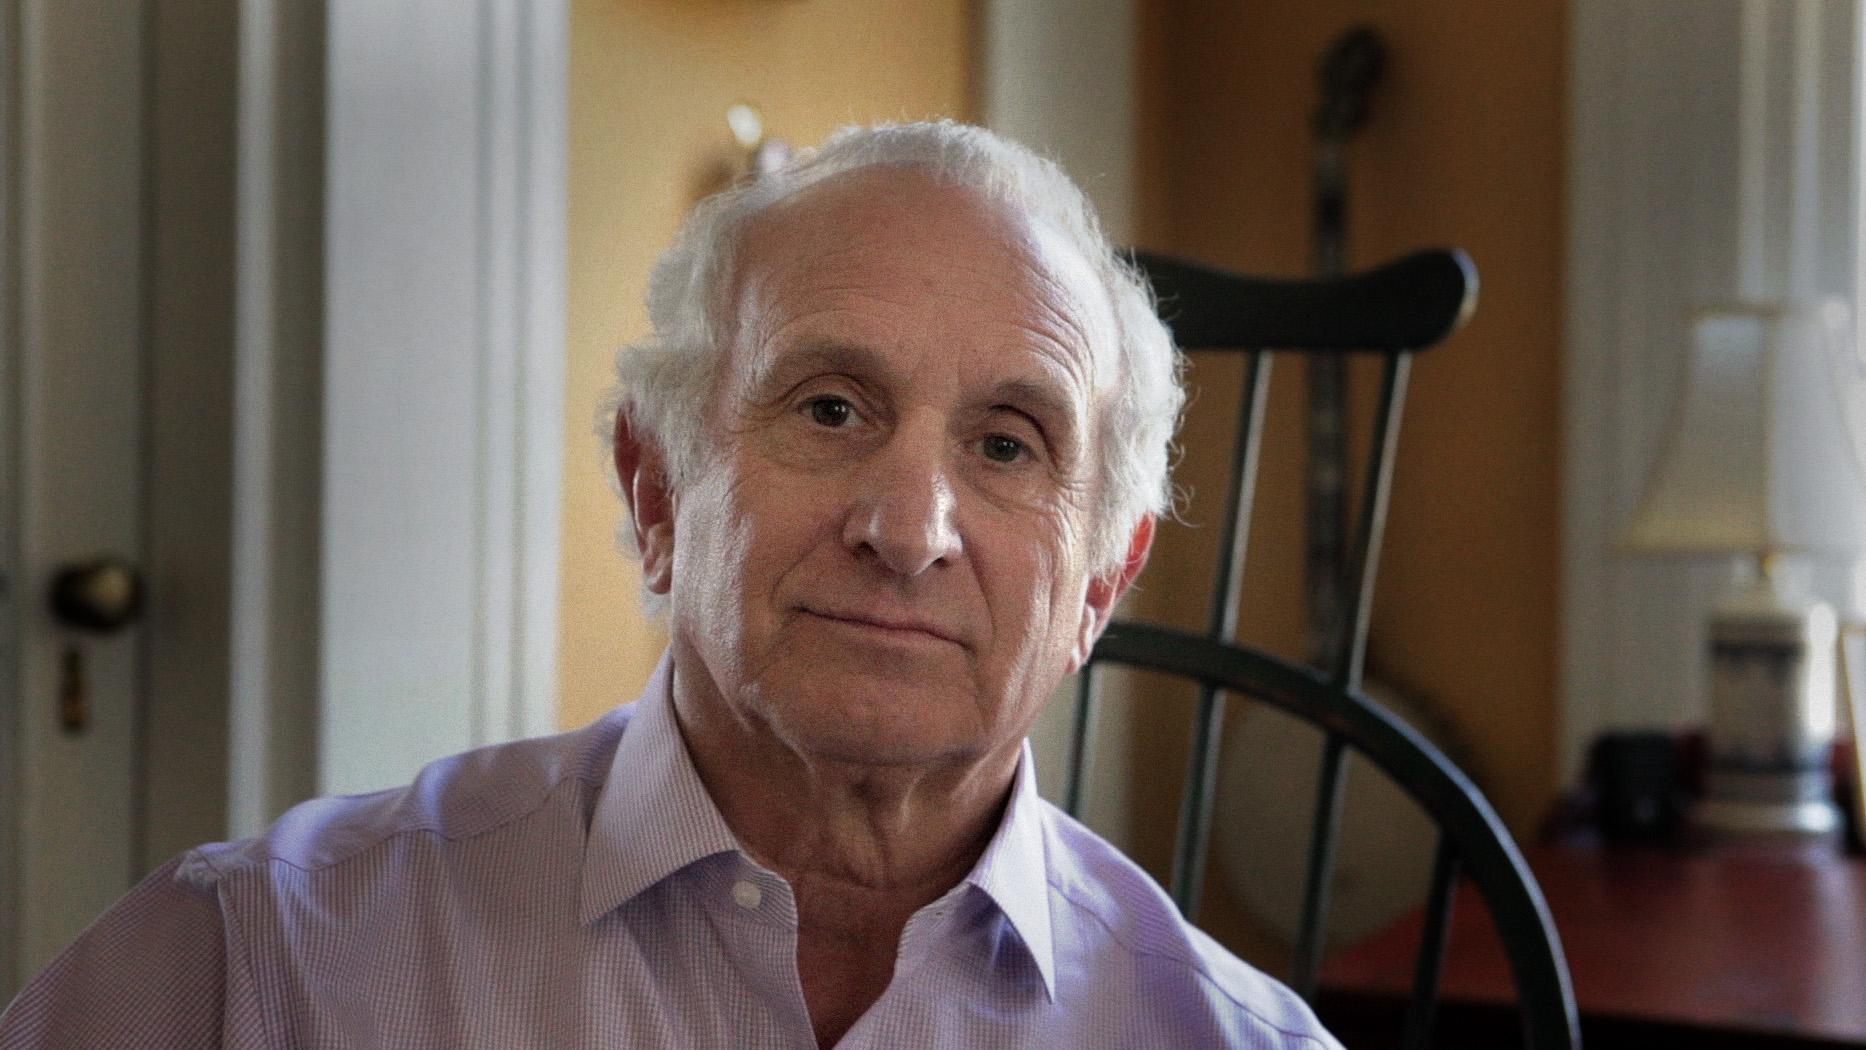 Peter Szego in his home in New Jersey. (Emon Hassan/Guitarkadia)